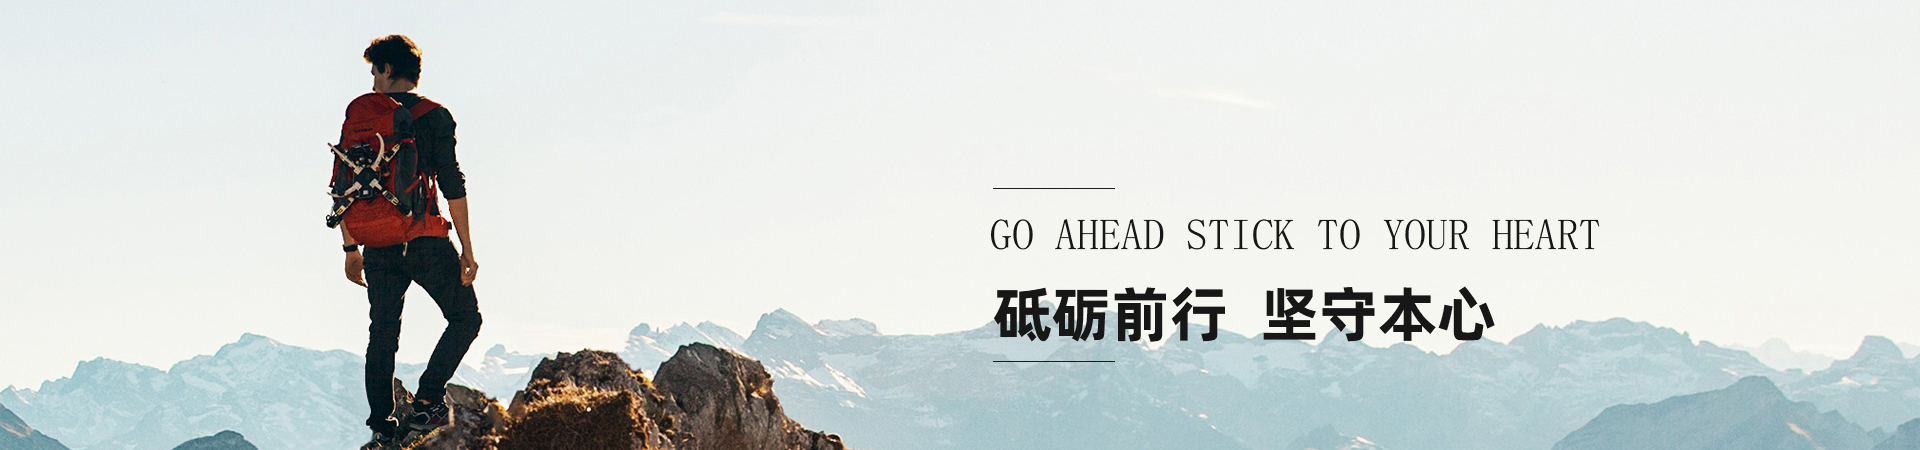 http://www.hongshuoziben.com/data/upload/201910/20191028115511_458.jpg